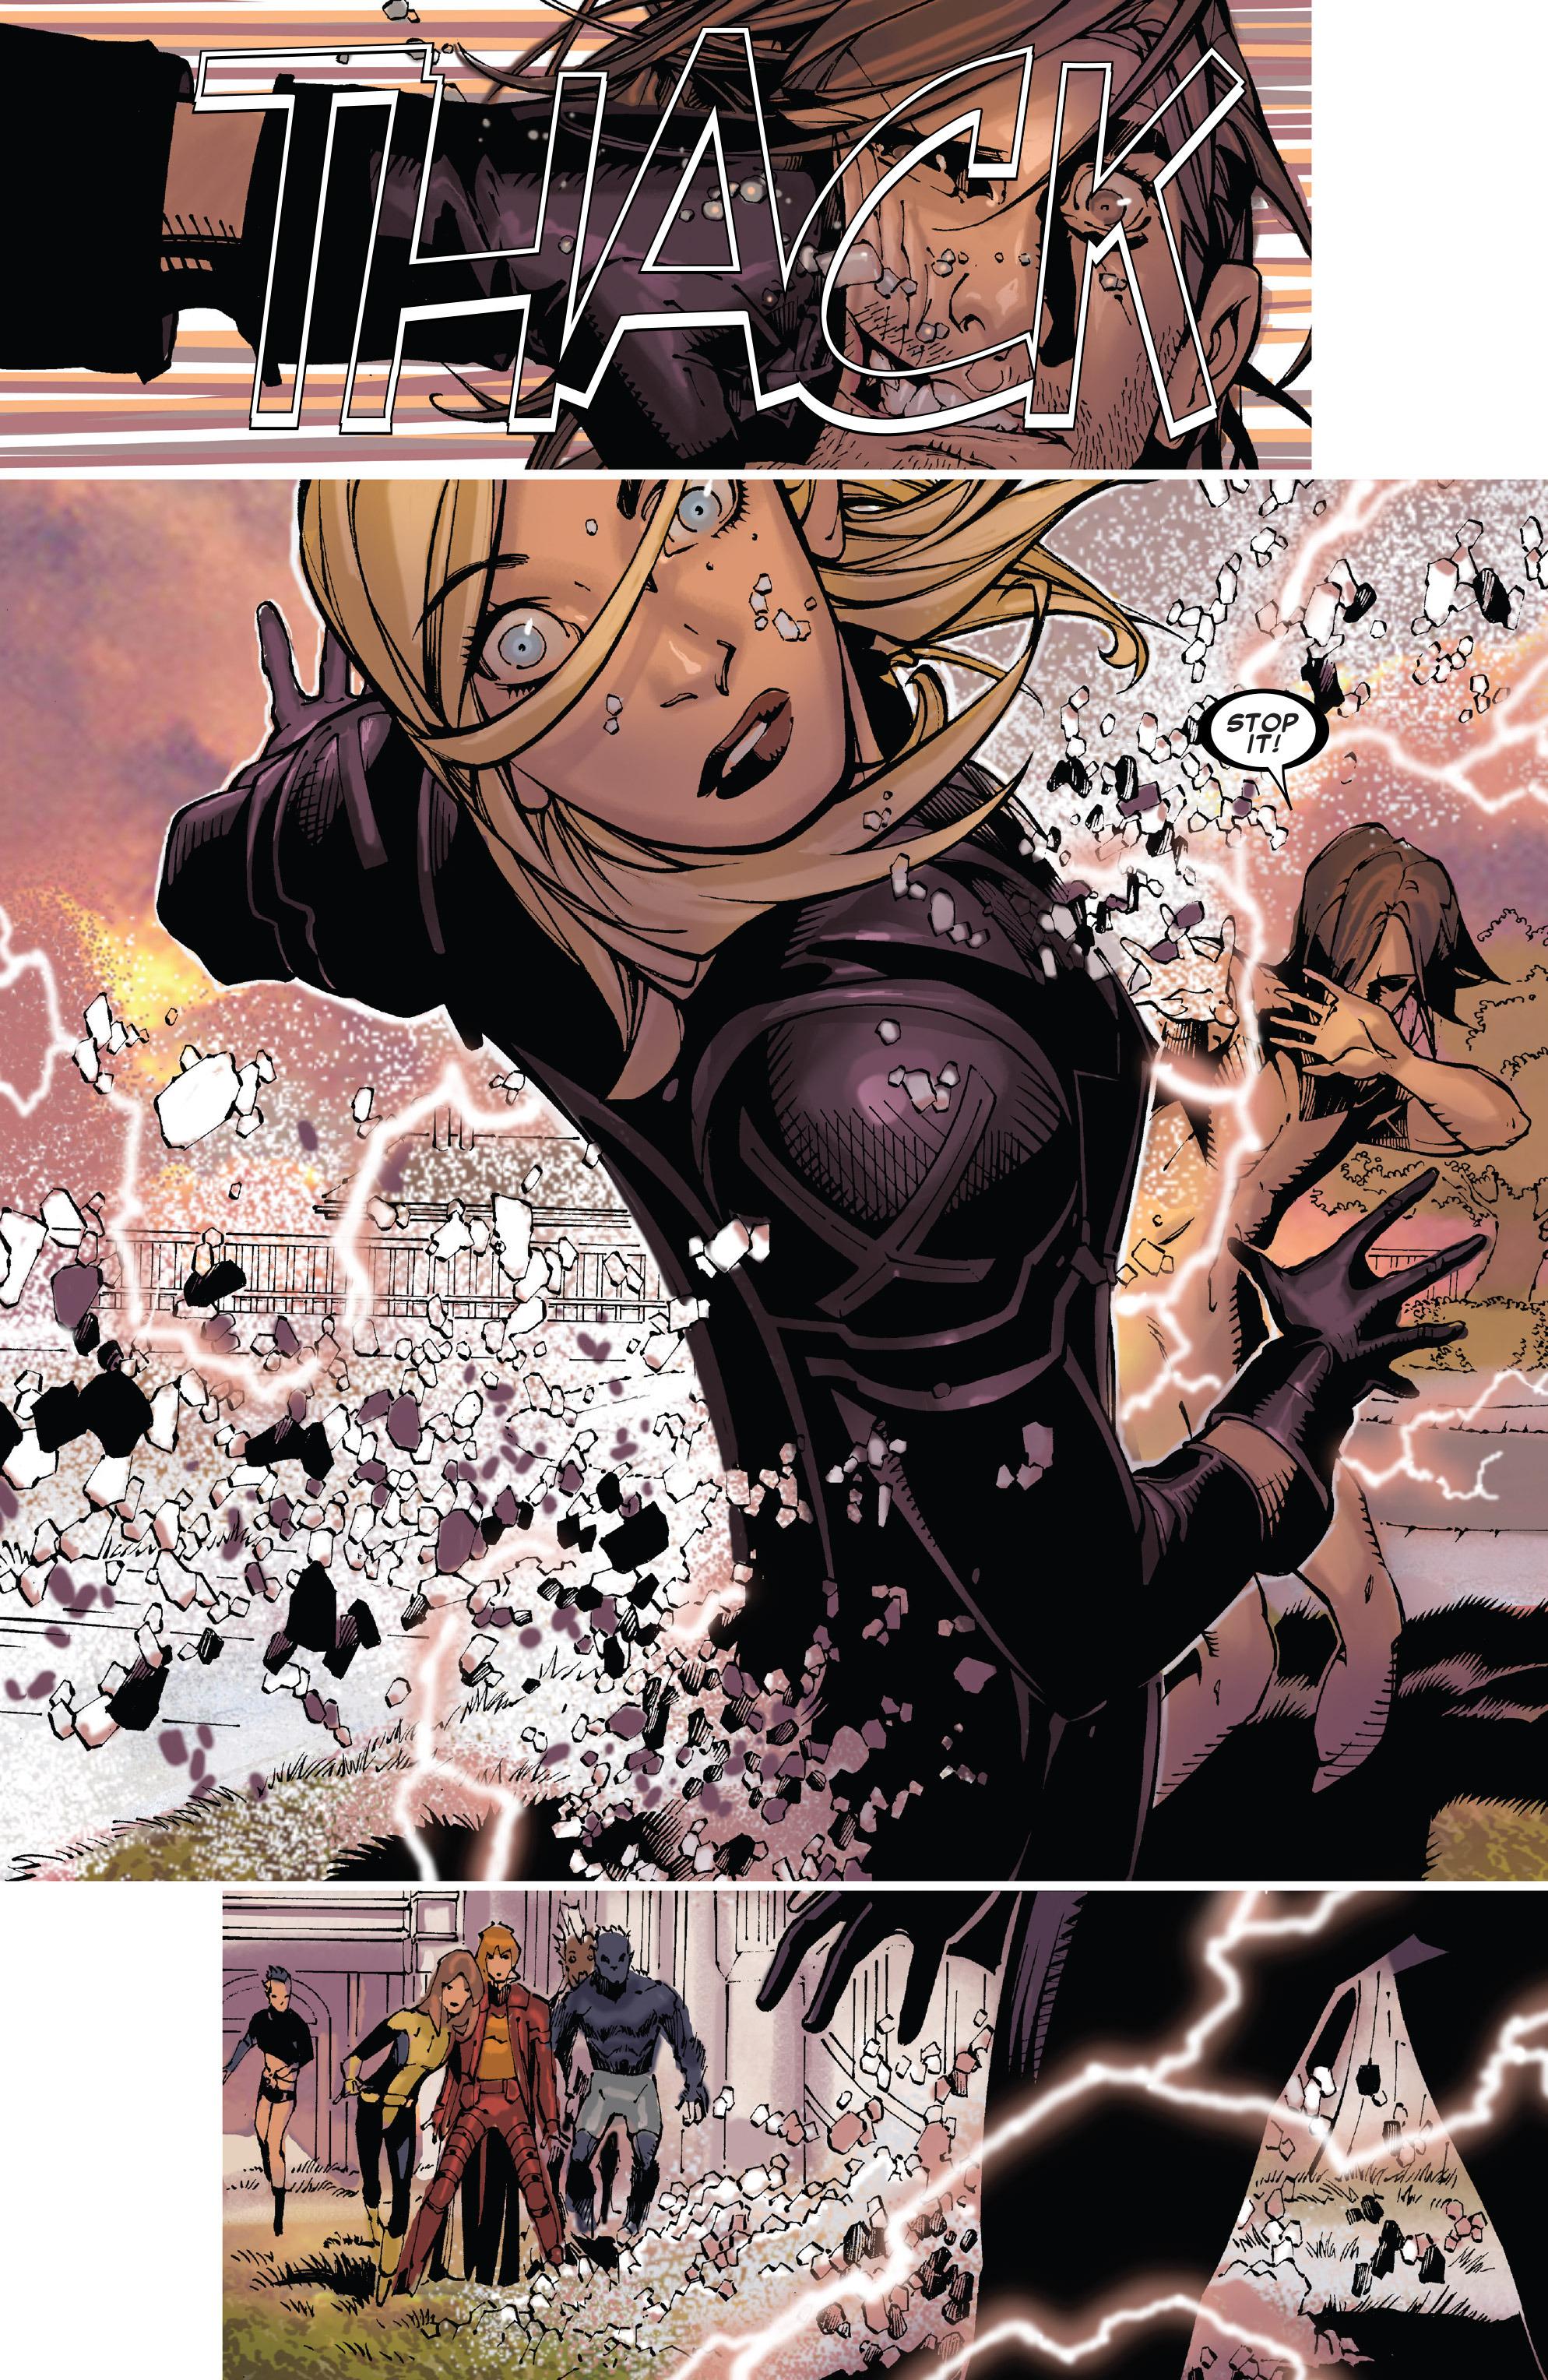 Read online Uncanny X-Men (2013) comic -  Issue # _TPB 5 - The Omega Mutant - 91